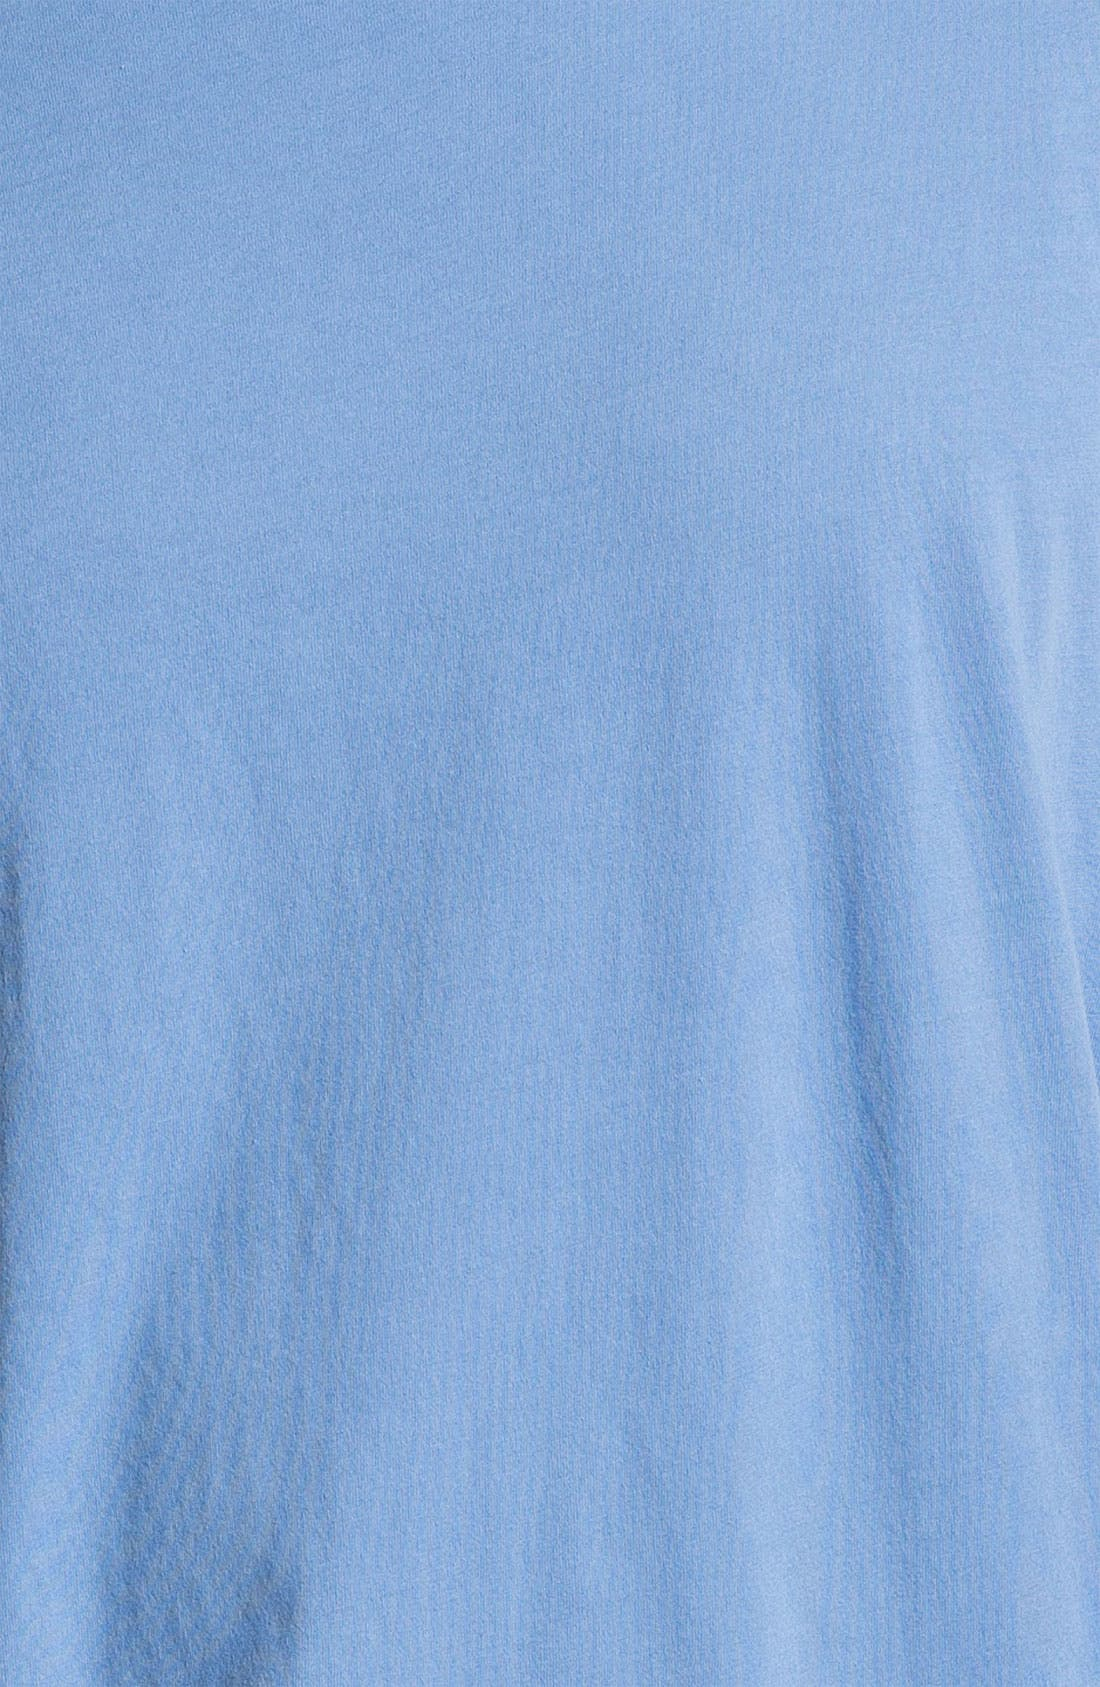 Alternate Image 3  - Wallin & Bros. Trim Fit Crewneck T-Shirt